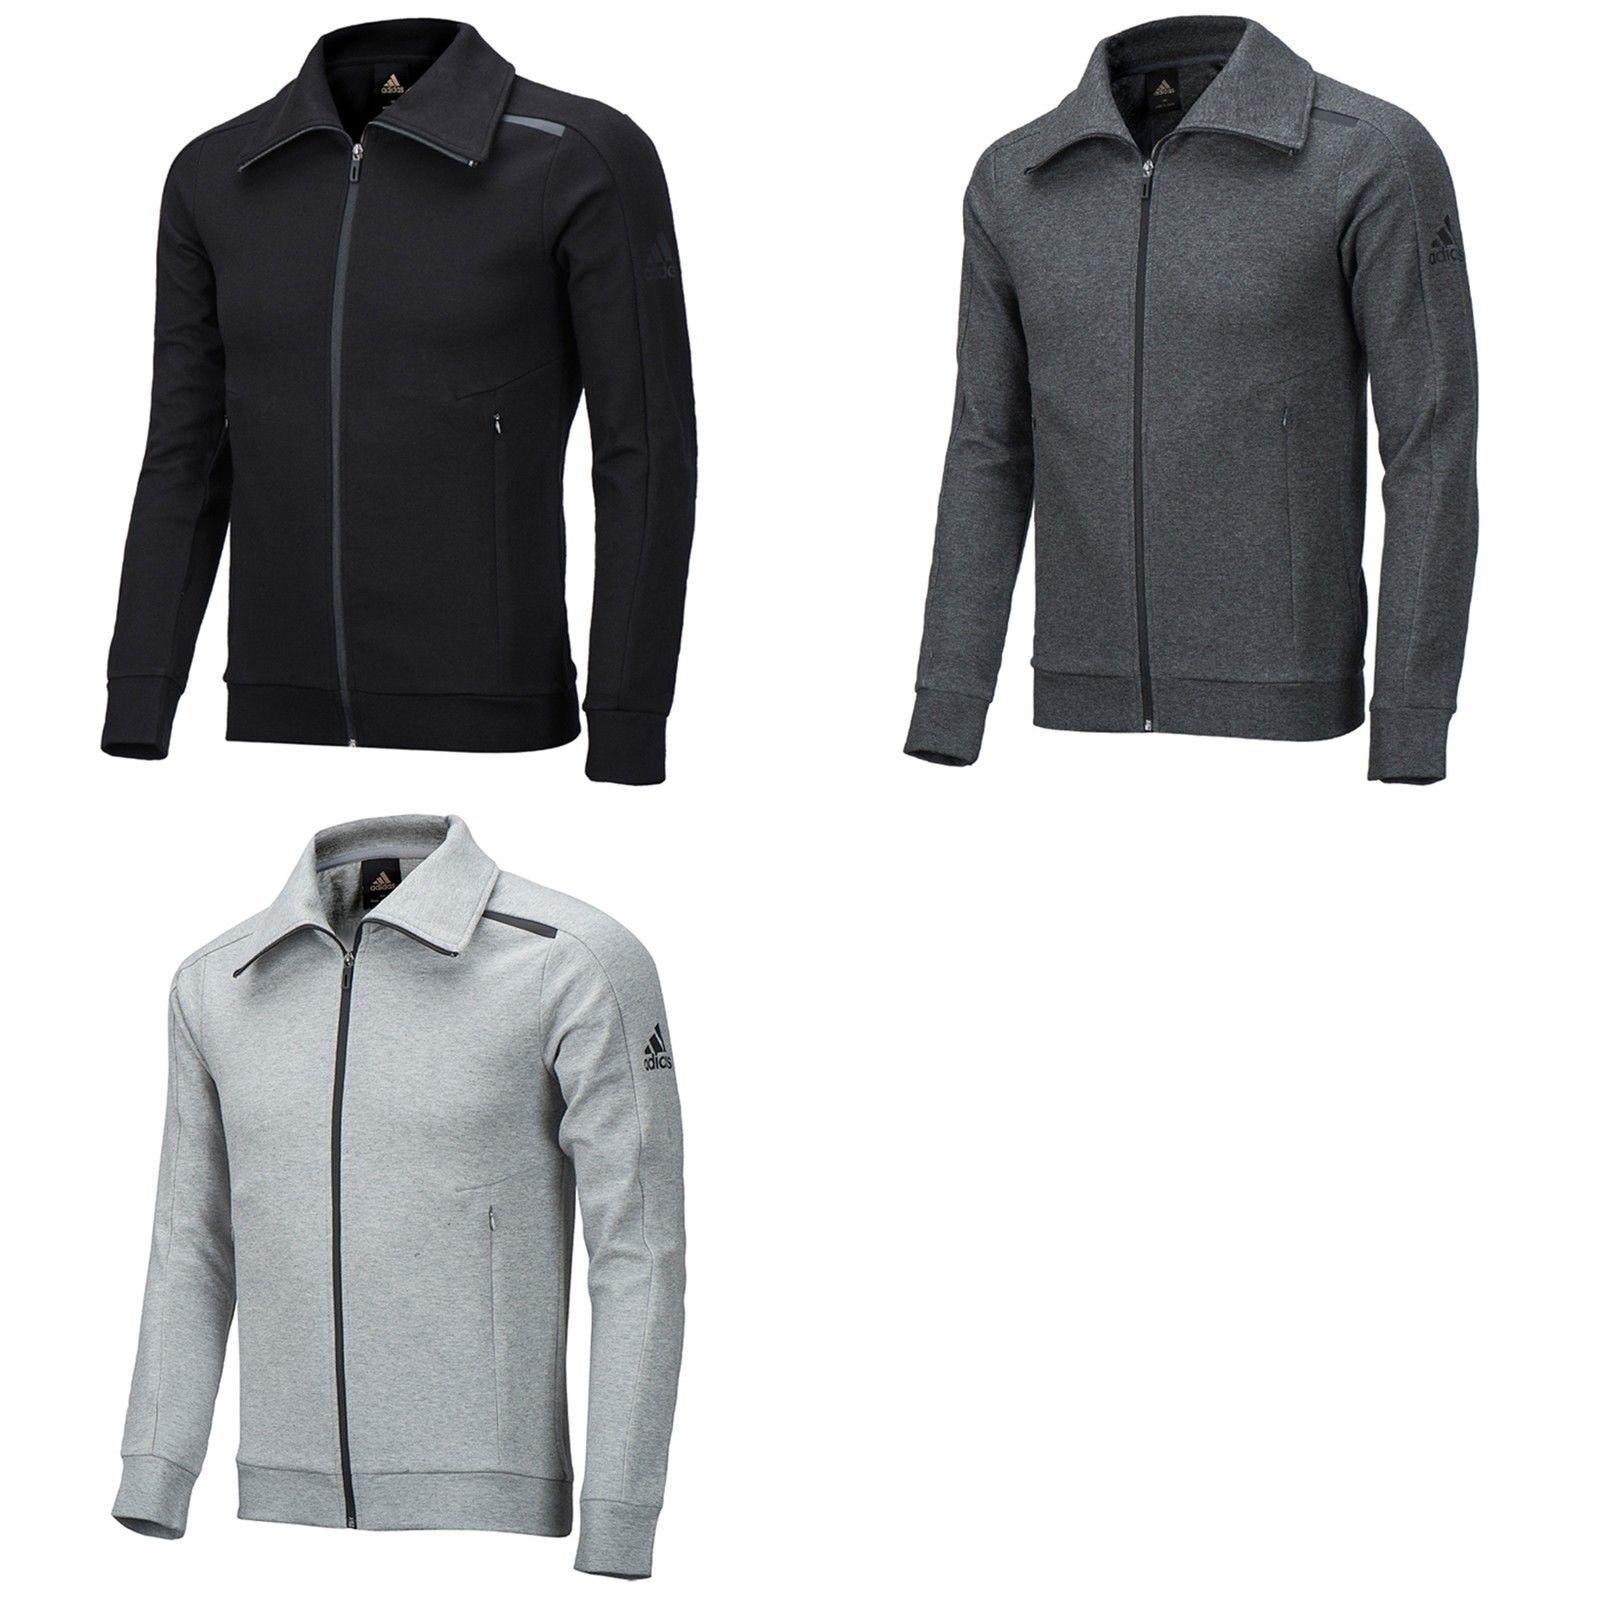 Adidas Men Knit Extend Jacket Sportler Top Fitness BG9050, BG9051, AY3732